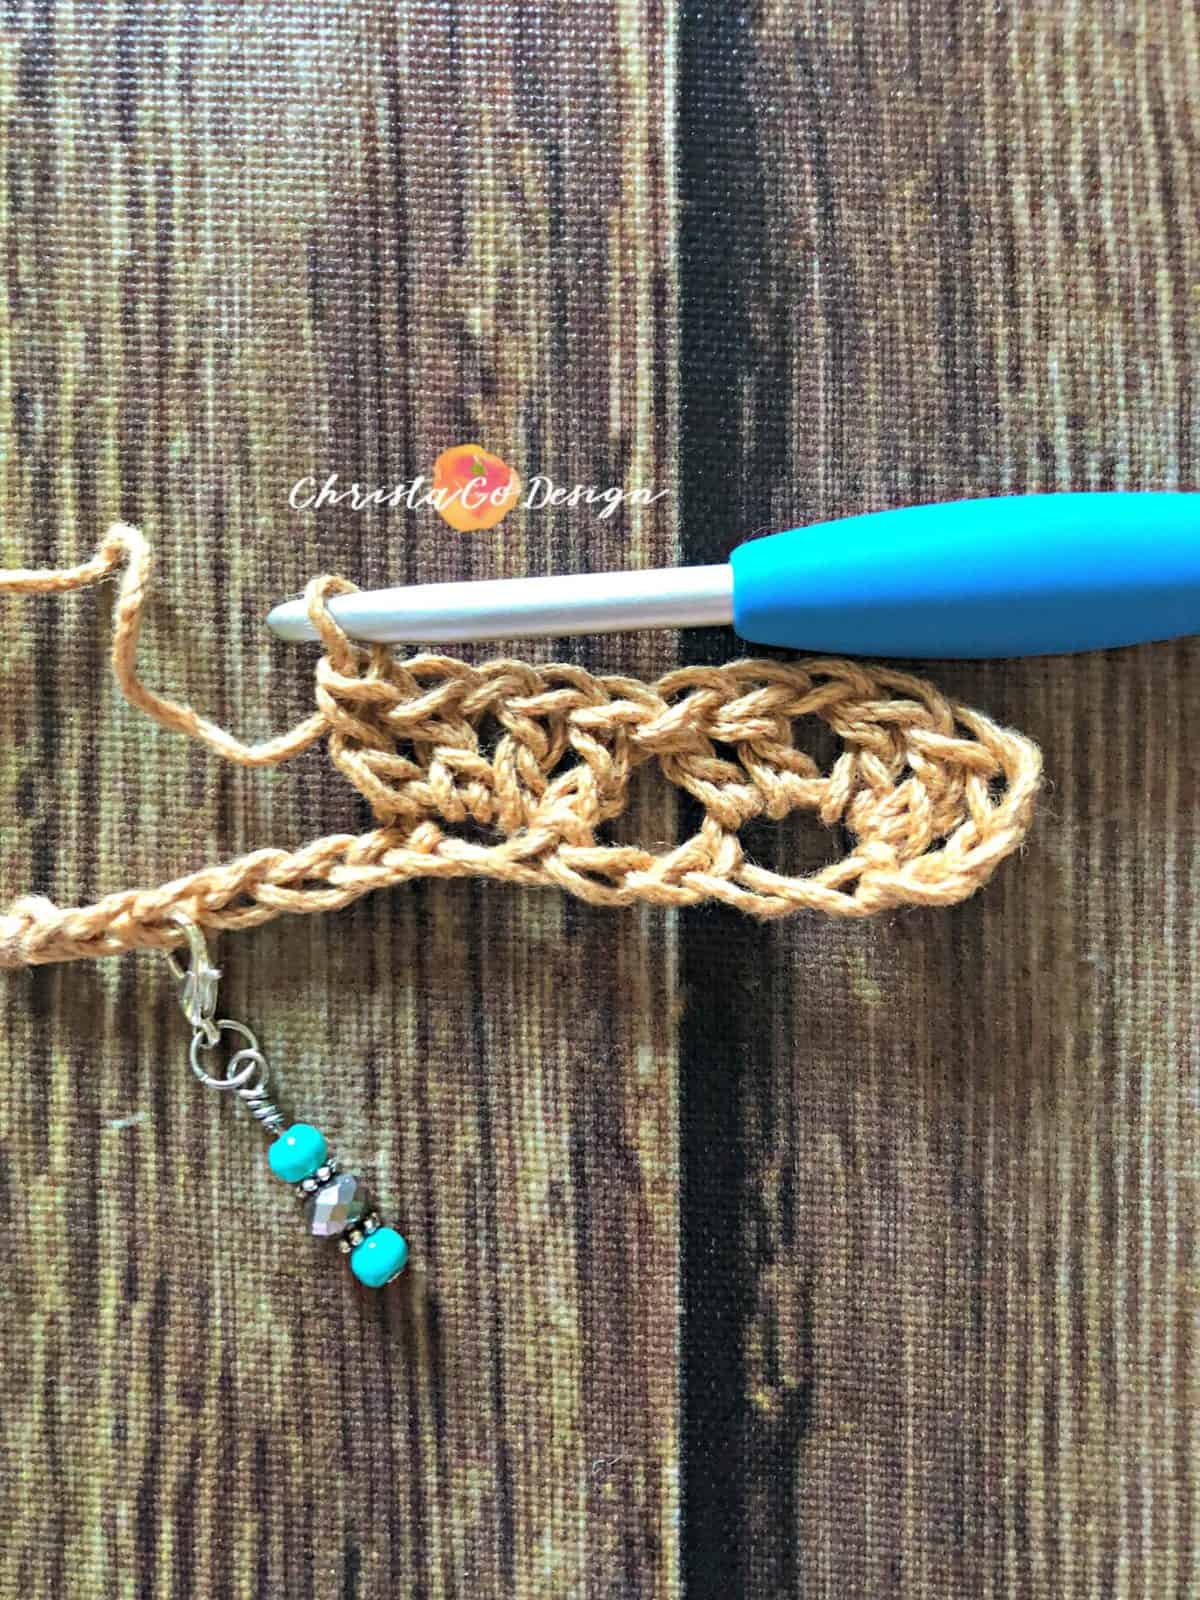 Second cluster in iris stitch tutorial.